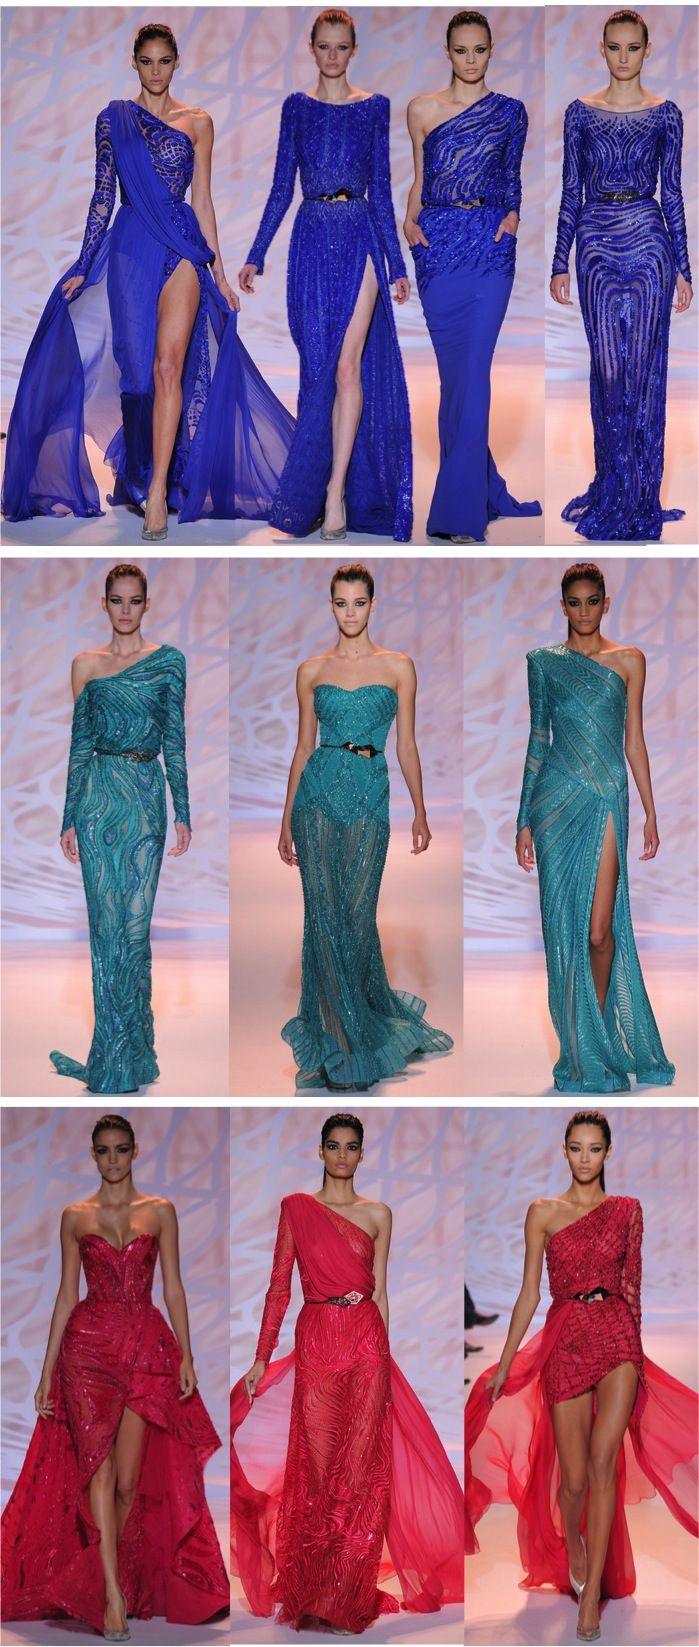 Fashionismo | Thereza Chammas » Arquivos » Zuhair Murad, Alta Costura poderosa